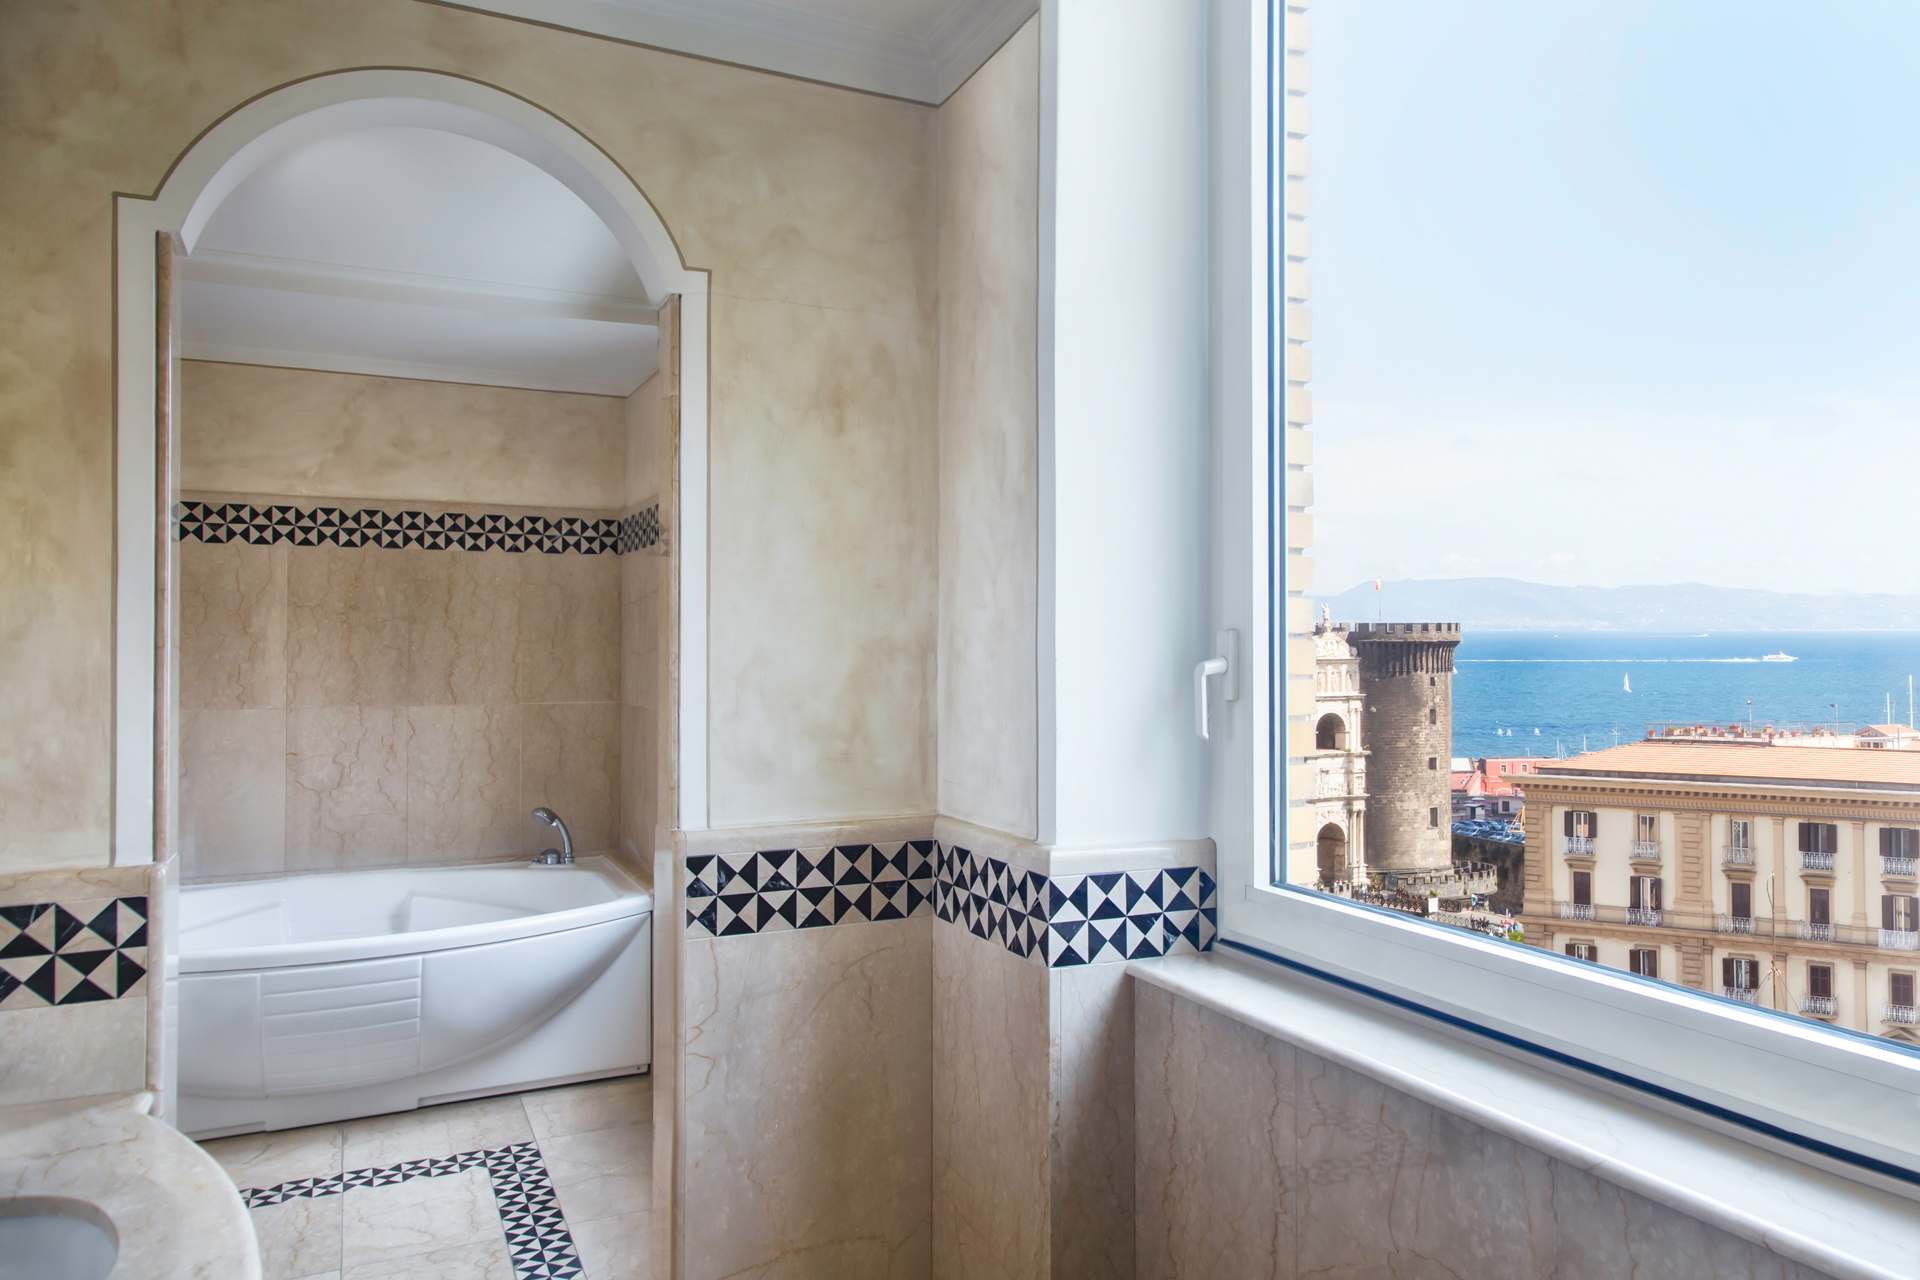 RH_NAPBR_presidential_bathroom_panorama